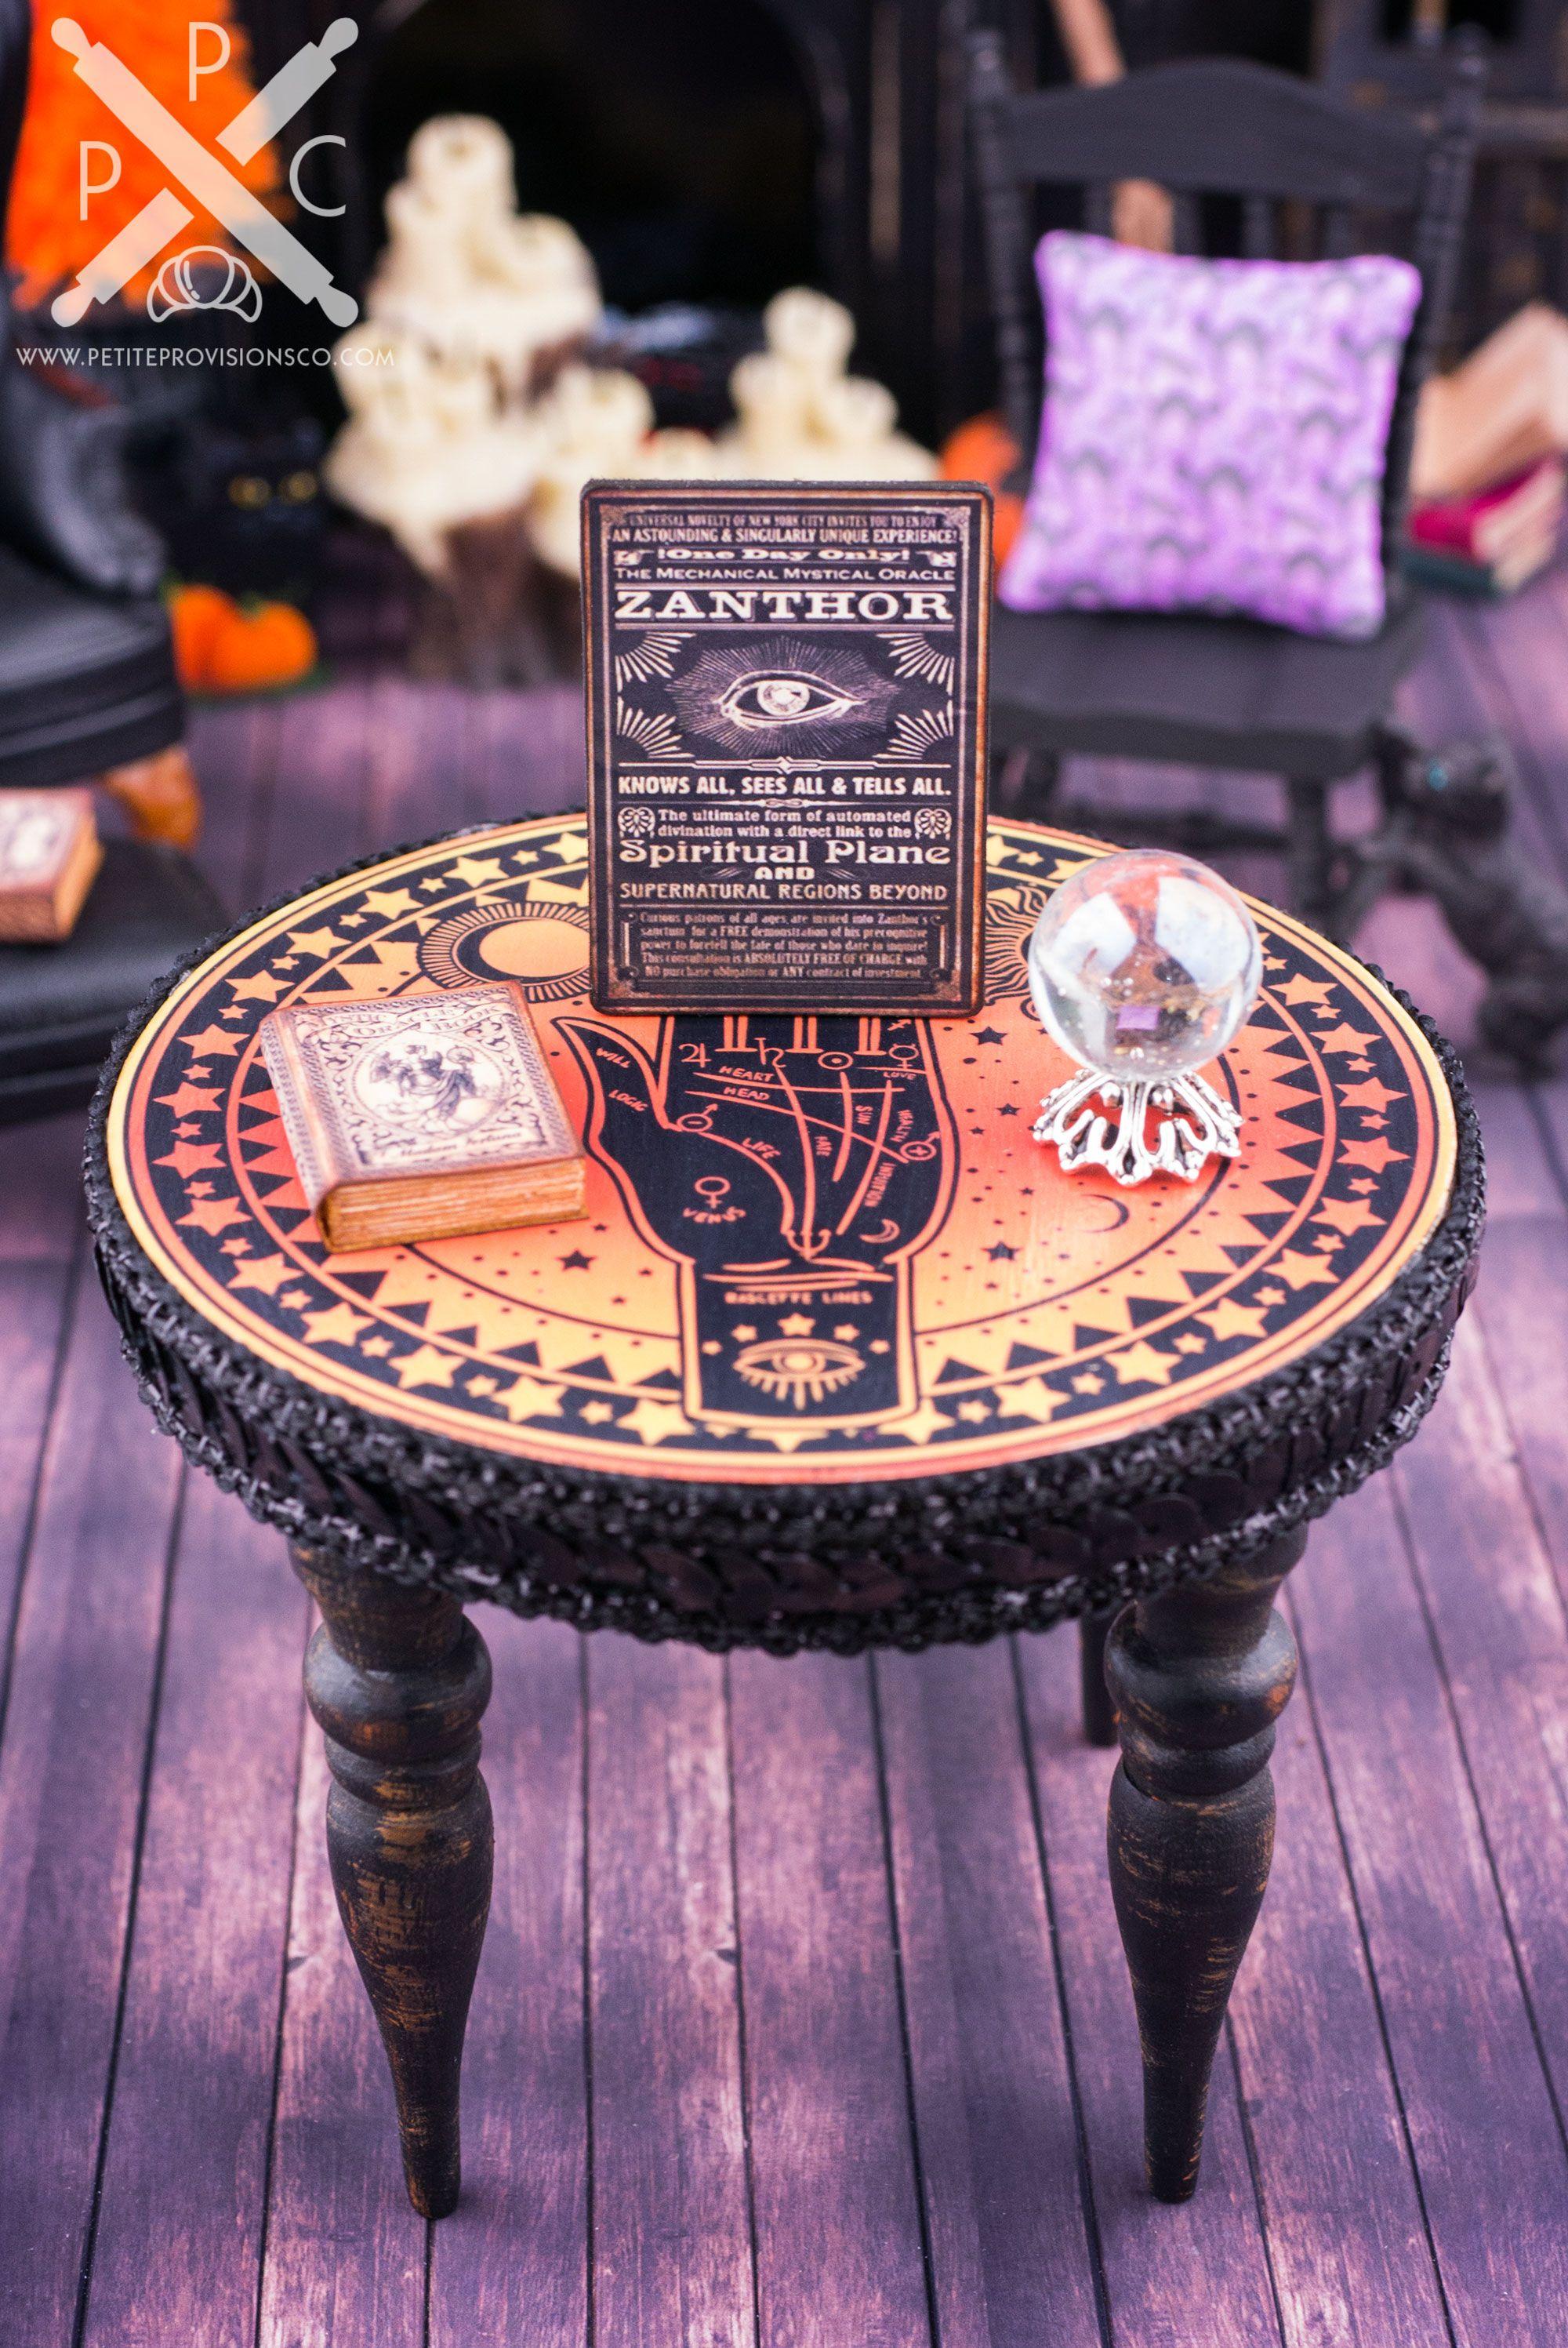 Dollhouse Miniature Palm Reader's Table Halloween Set - 1:12 Dollhouse Miniature - The Petite Provisions Co.